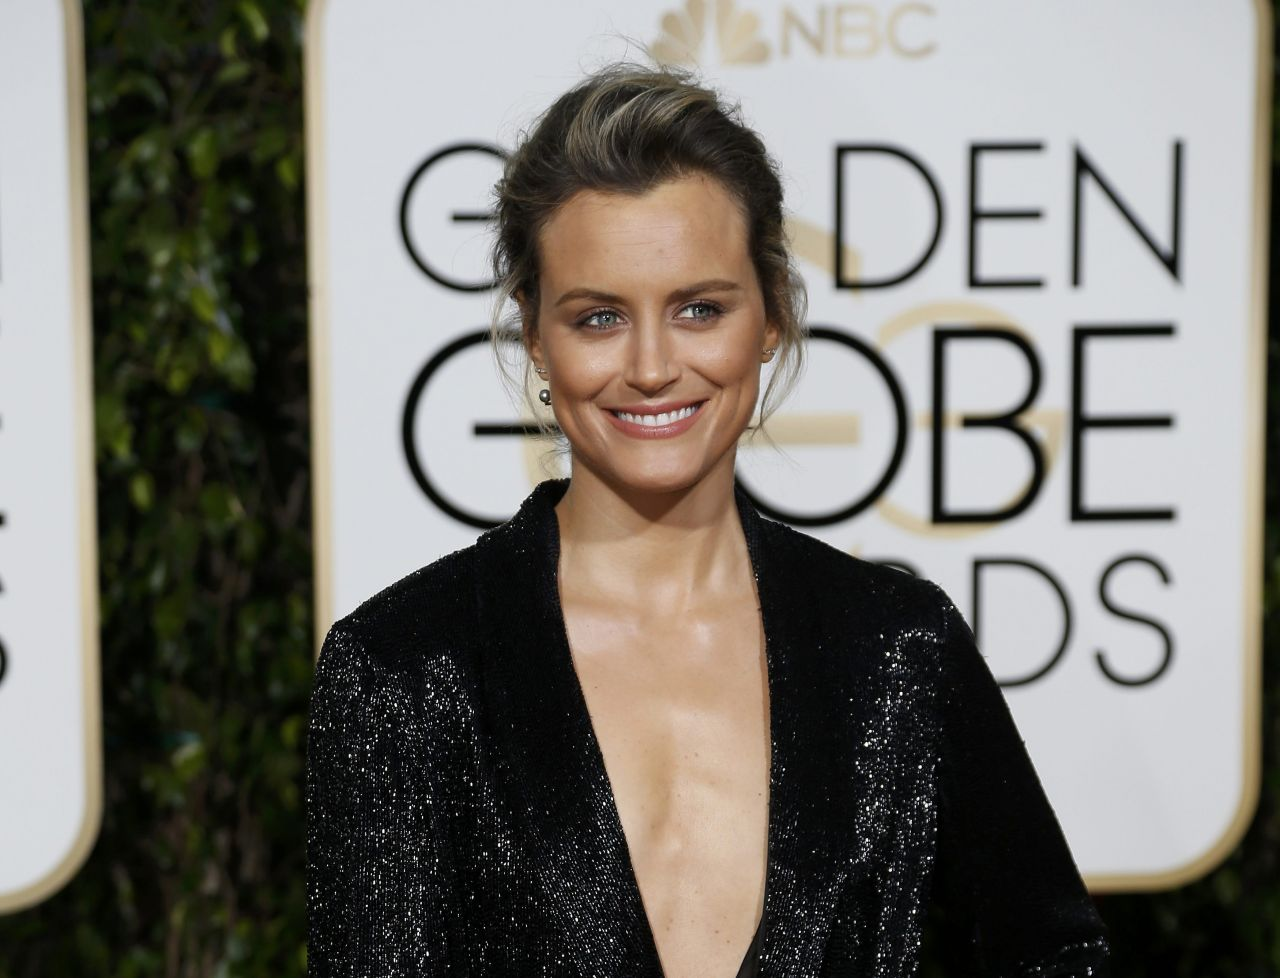 Taylor Schilling – 2016 Golden Globe Awards in Beverly HillsTaylor Schilling Golden Globes 2016